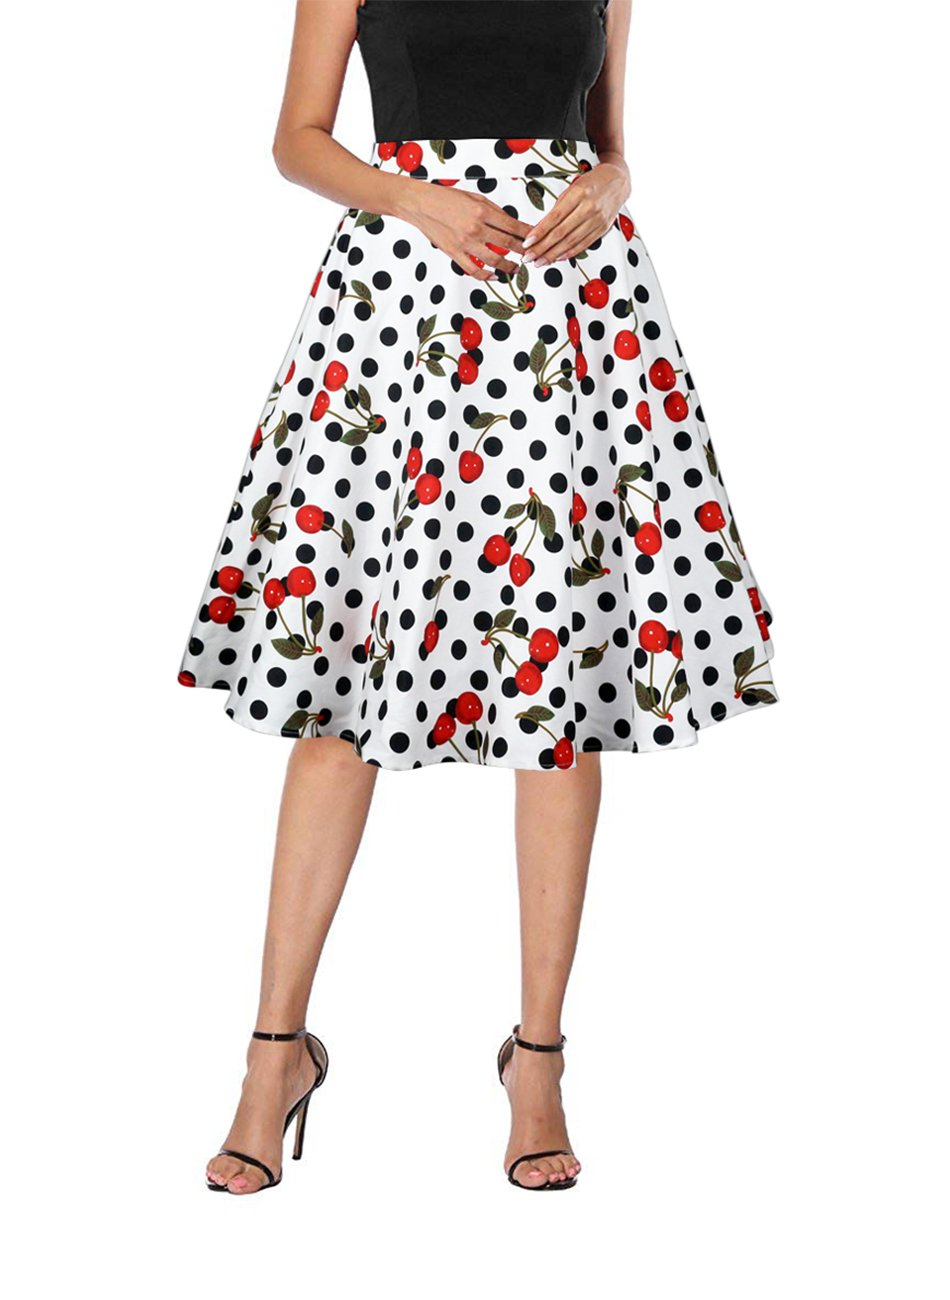 Yanmei Women's Cherry and Polka Dot Print Skirt Knee Length Christmas Party Skirt White Large 1086-8